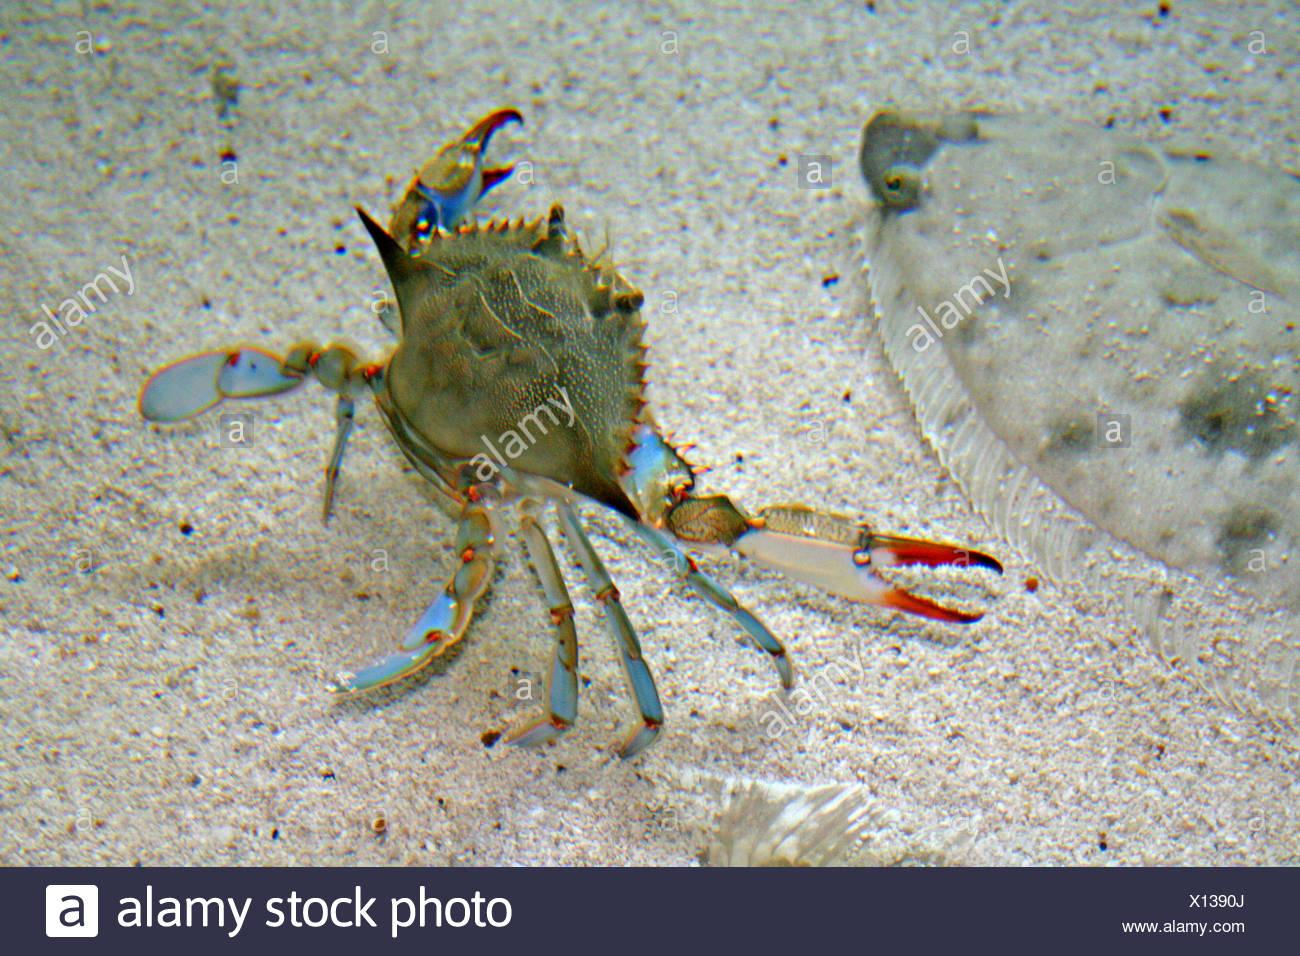 Crab North Carolina Stock Photos Amp Crab North Carolina